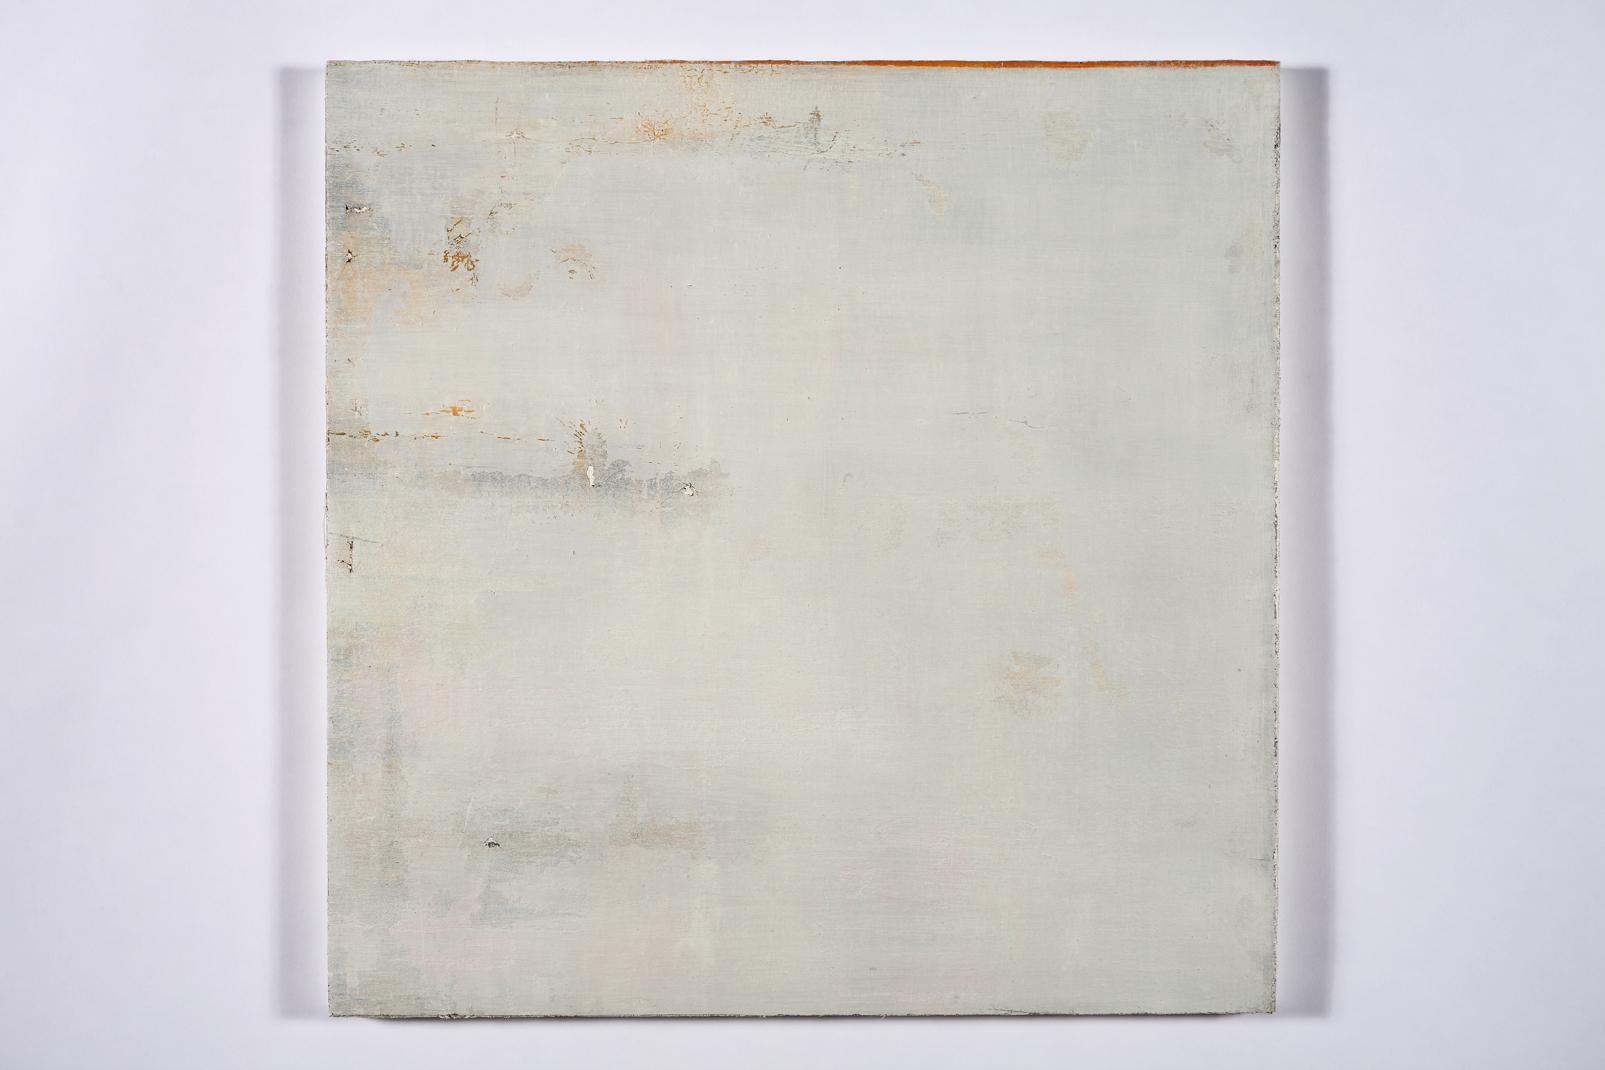 "faint murmur, (sky splits)   oil on salvaged canvas mounted on panel 24x24""  2008-2012  $750"